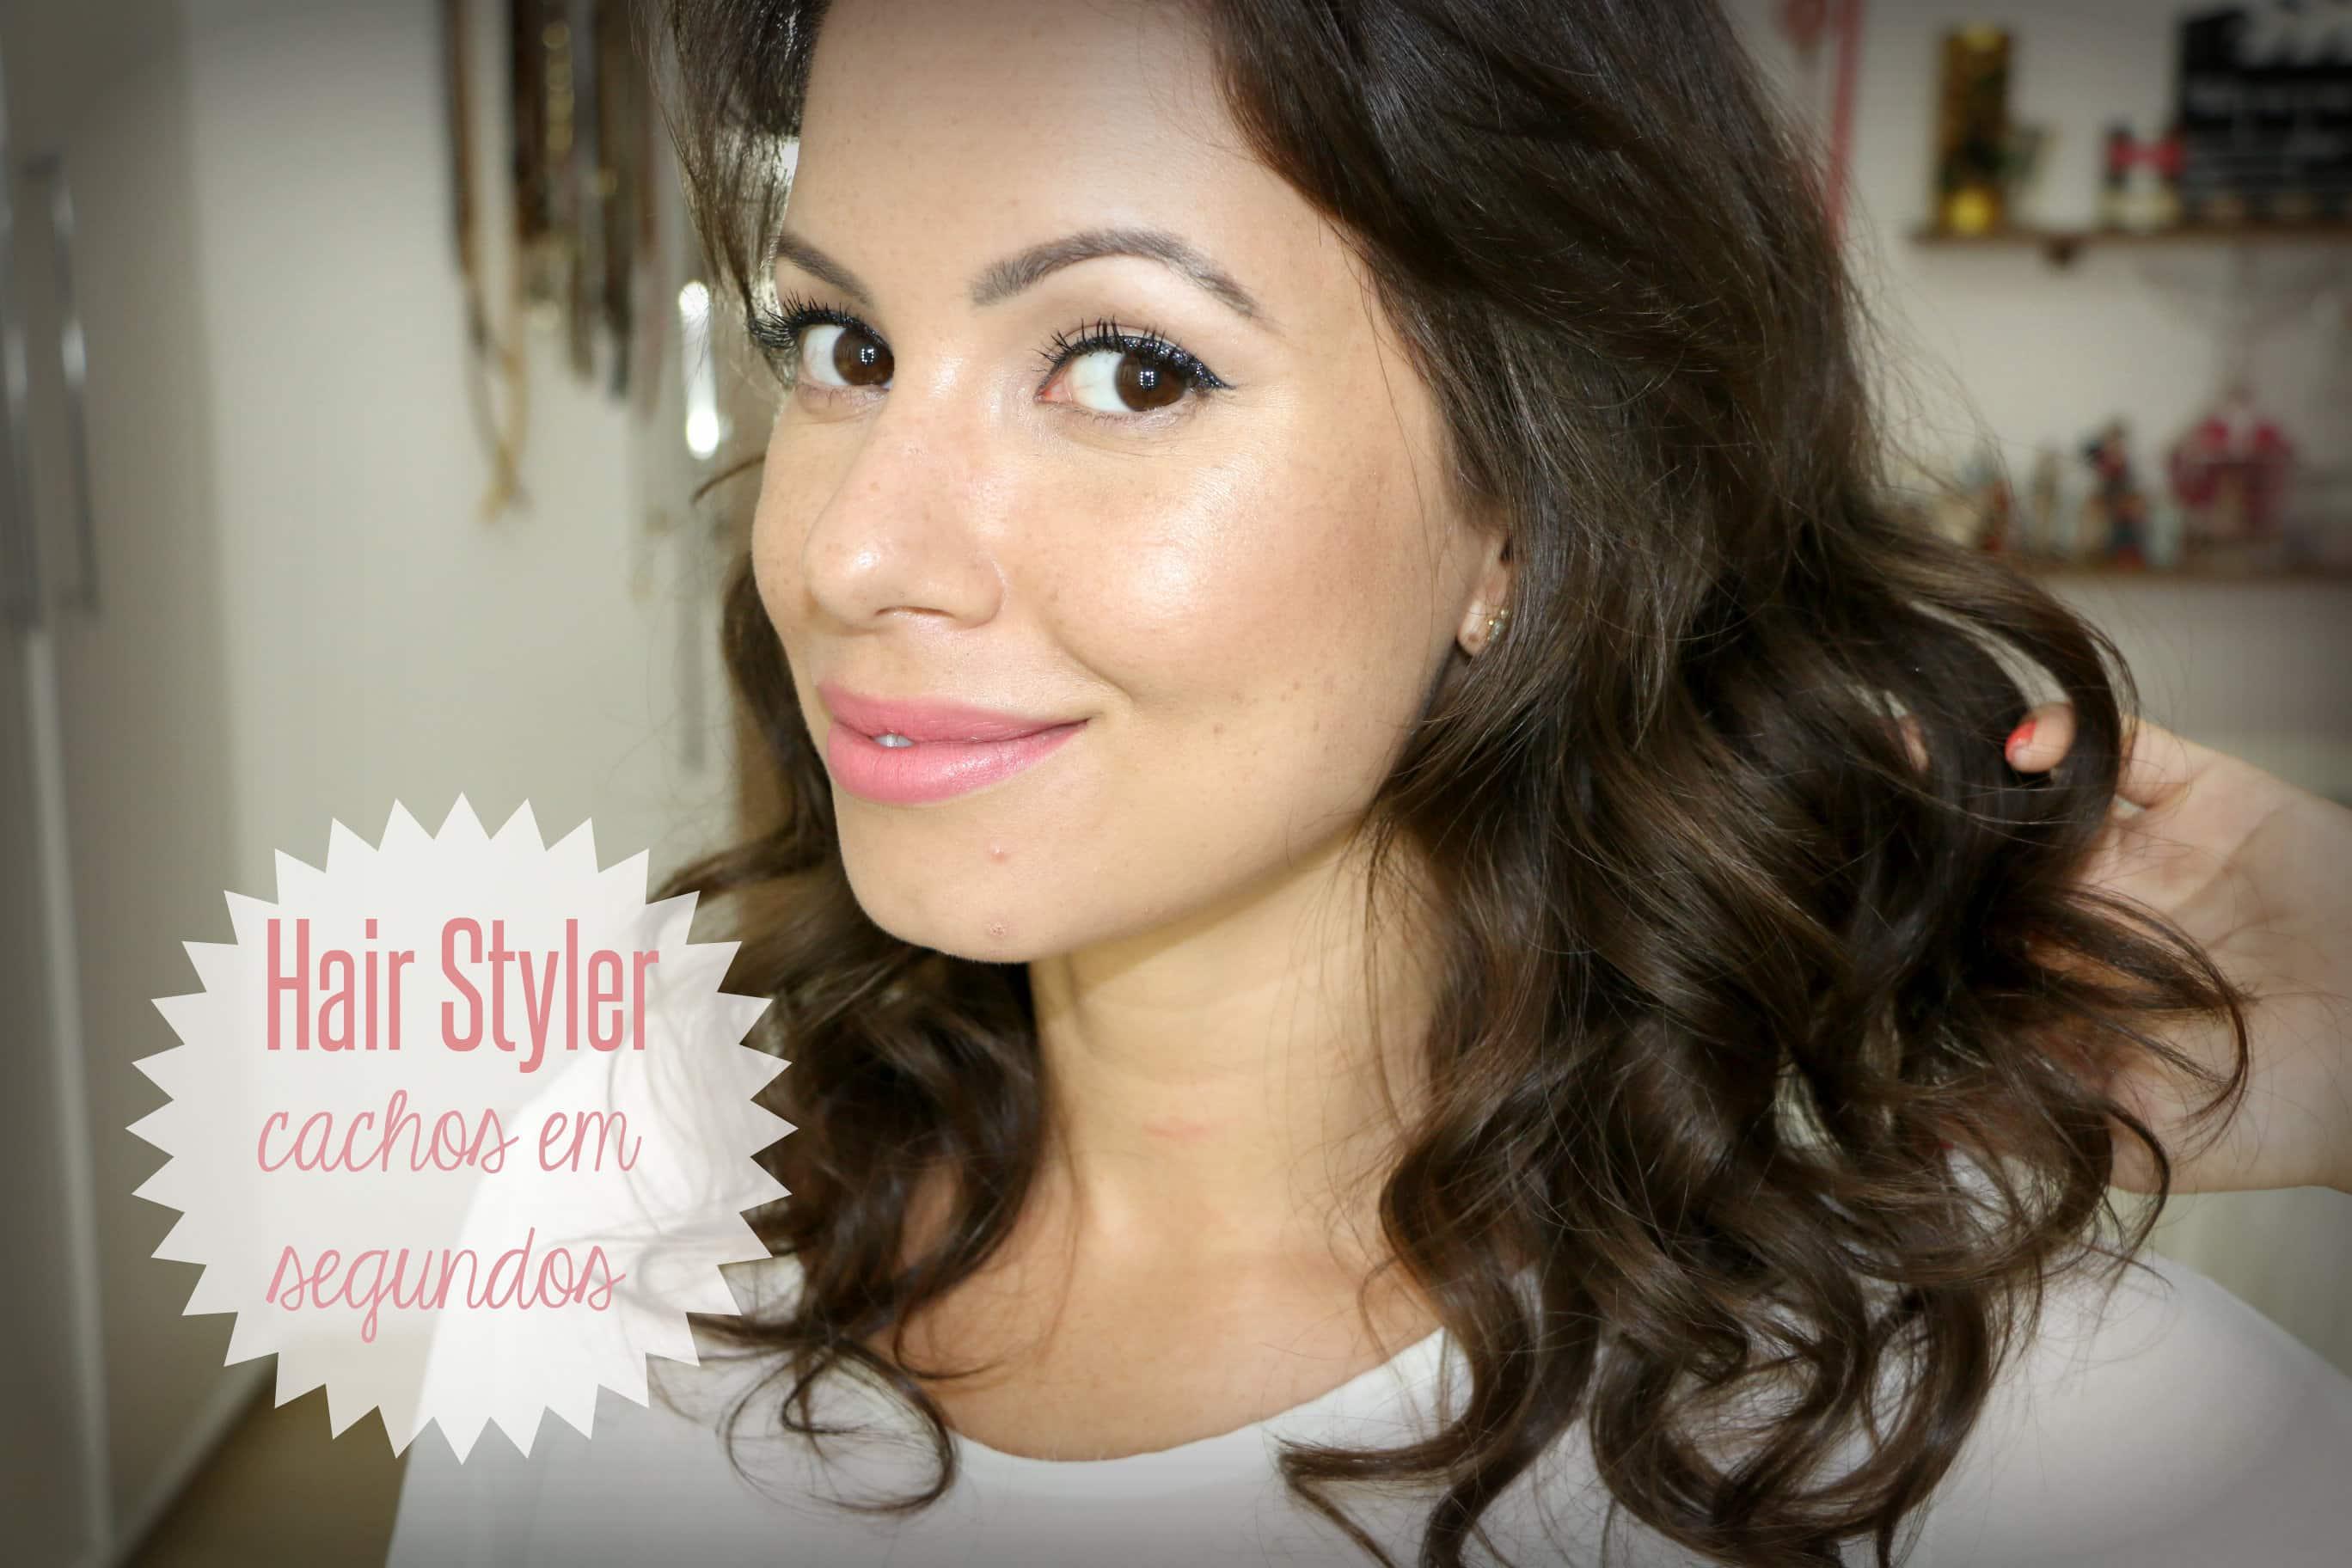 juliana goes hair styler miracurl - Hair Styler Polishop   Cachos Perfeitos, na Hora!